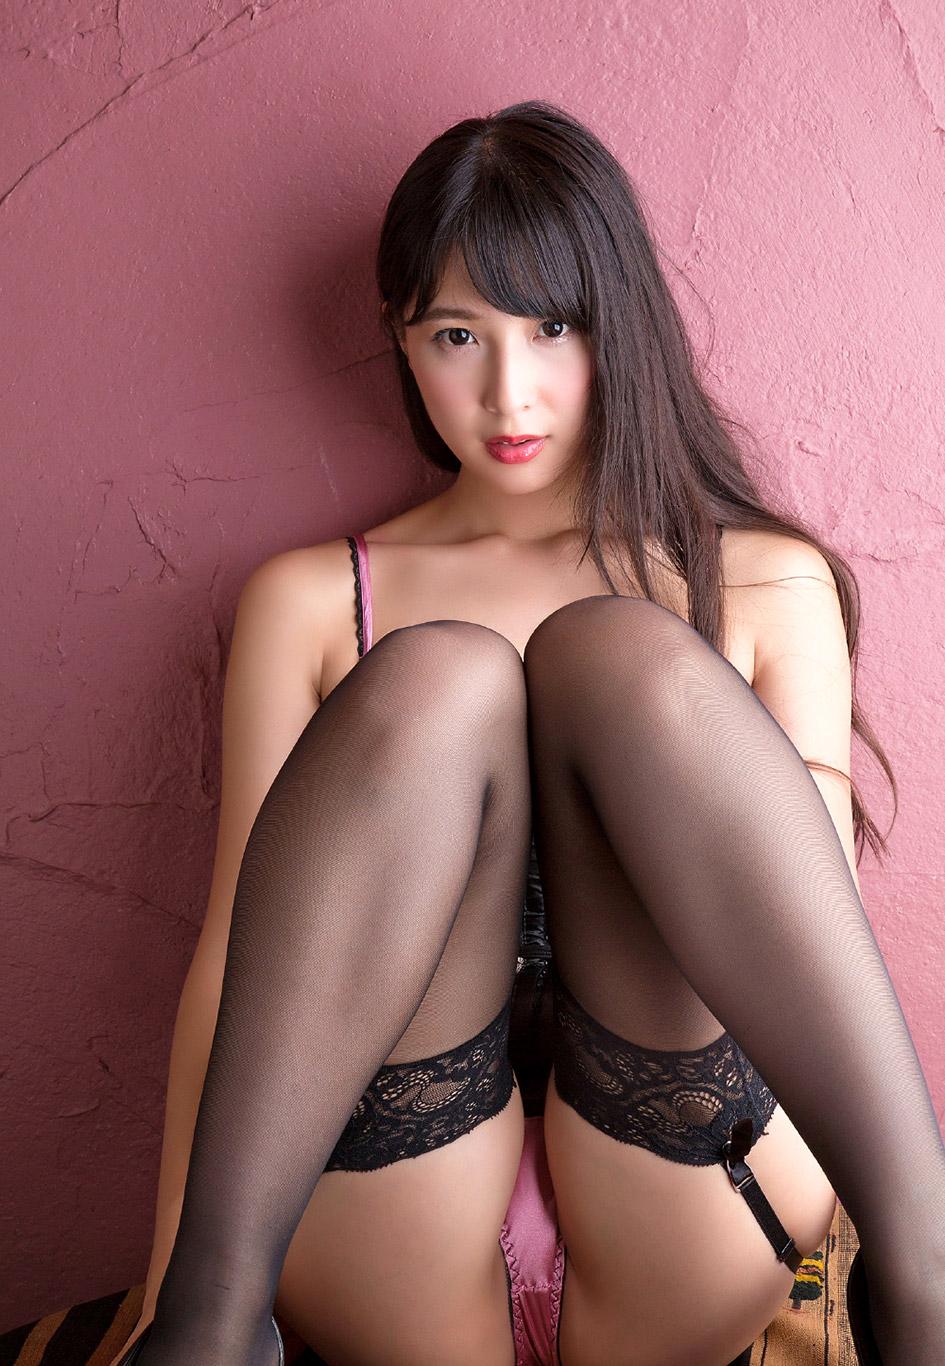 Hitomi Tanaka 田中瞳 Photo Tube Gallery Page 1  JJGirls AV Girls